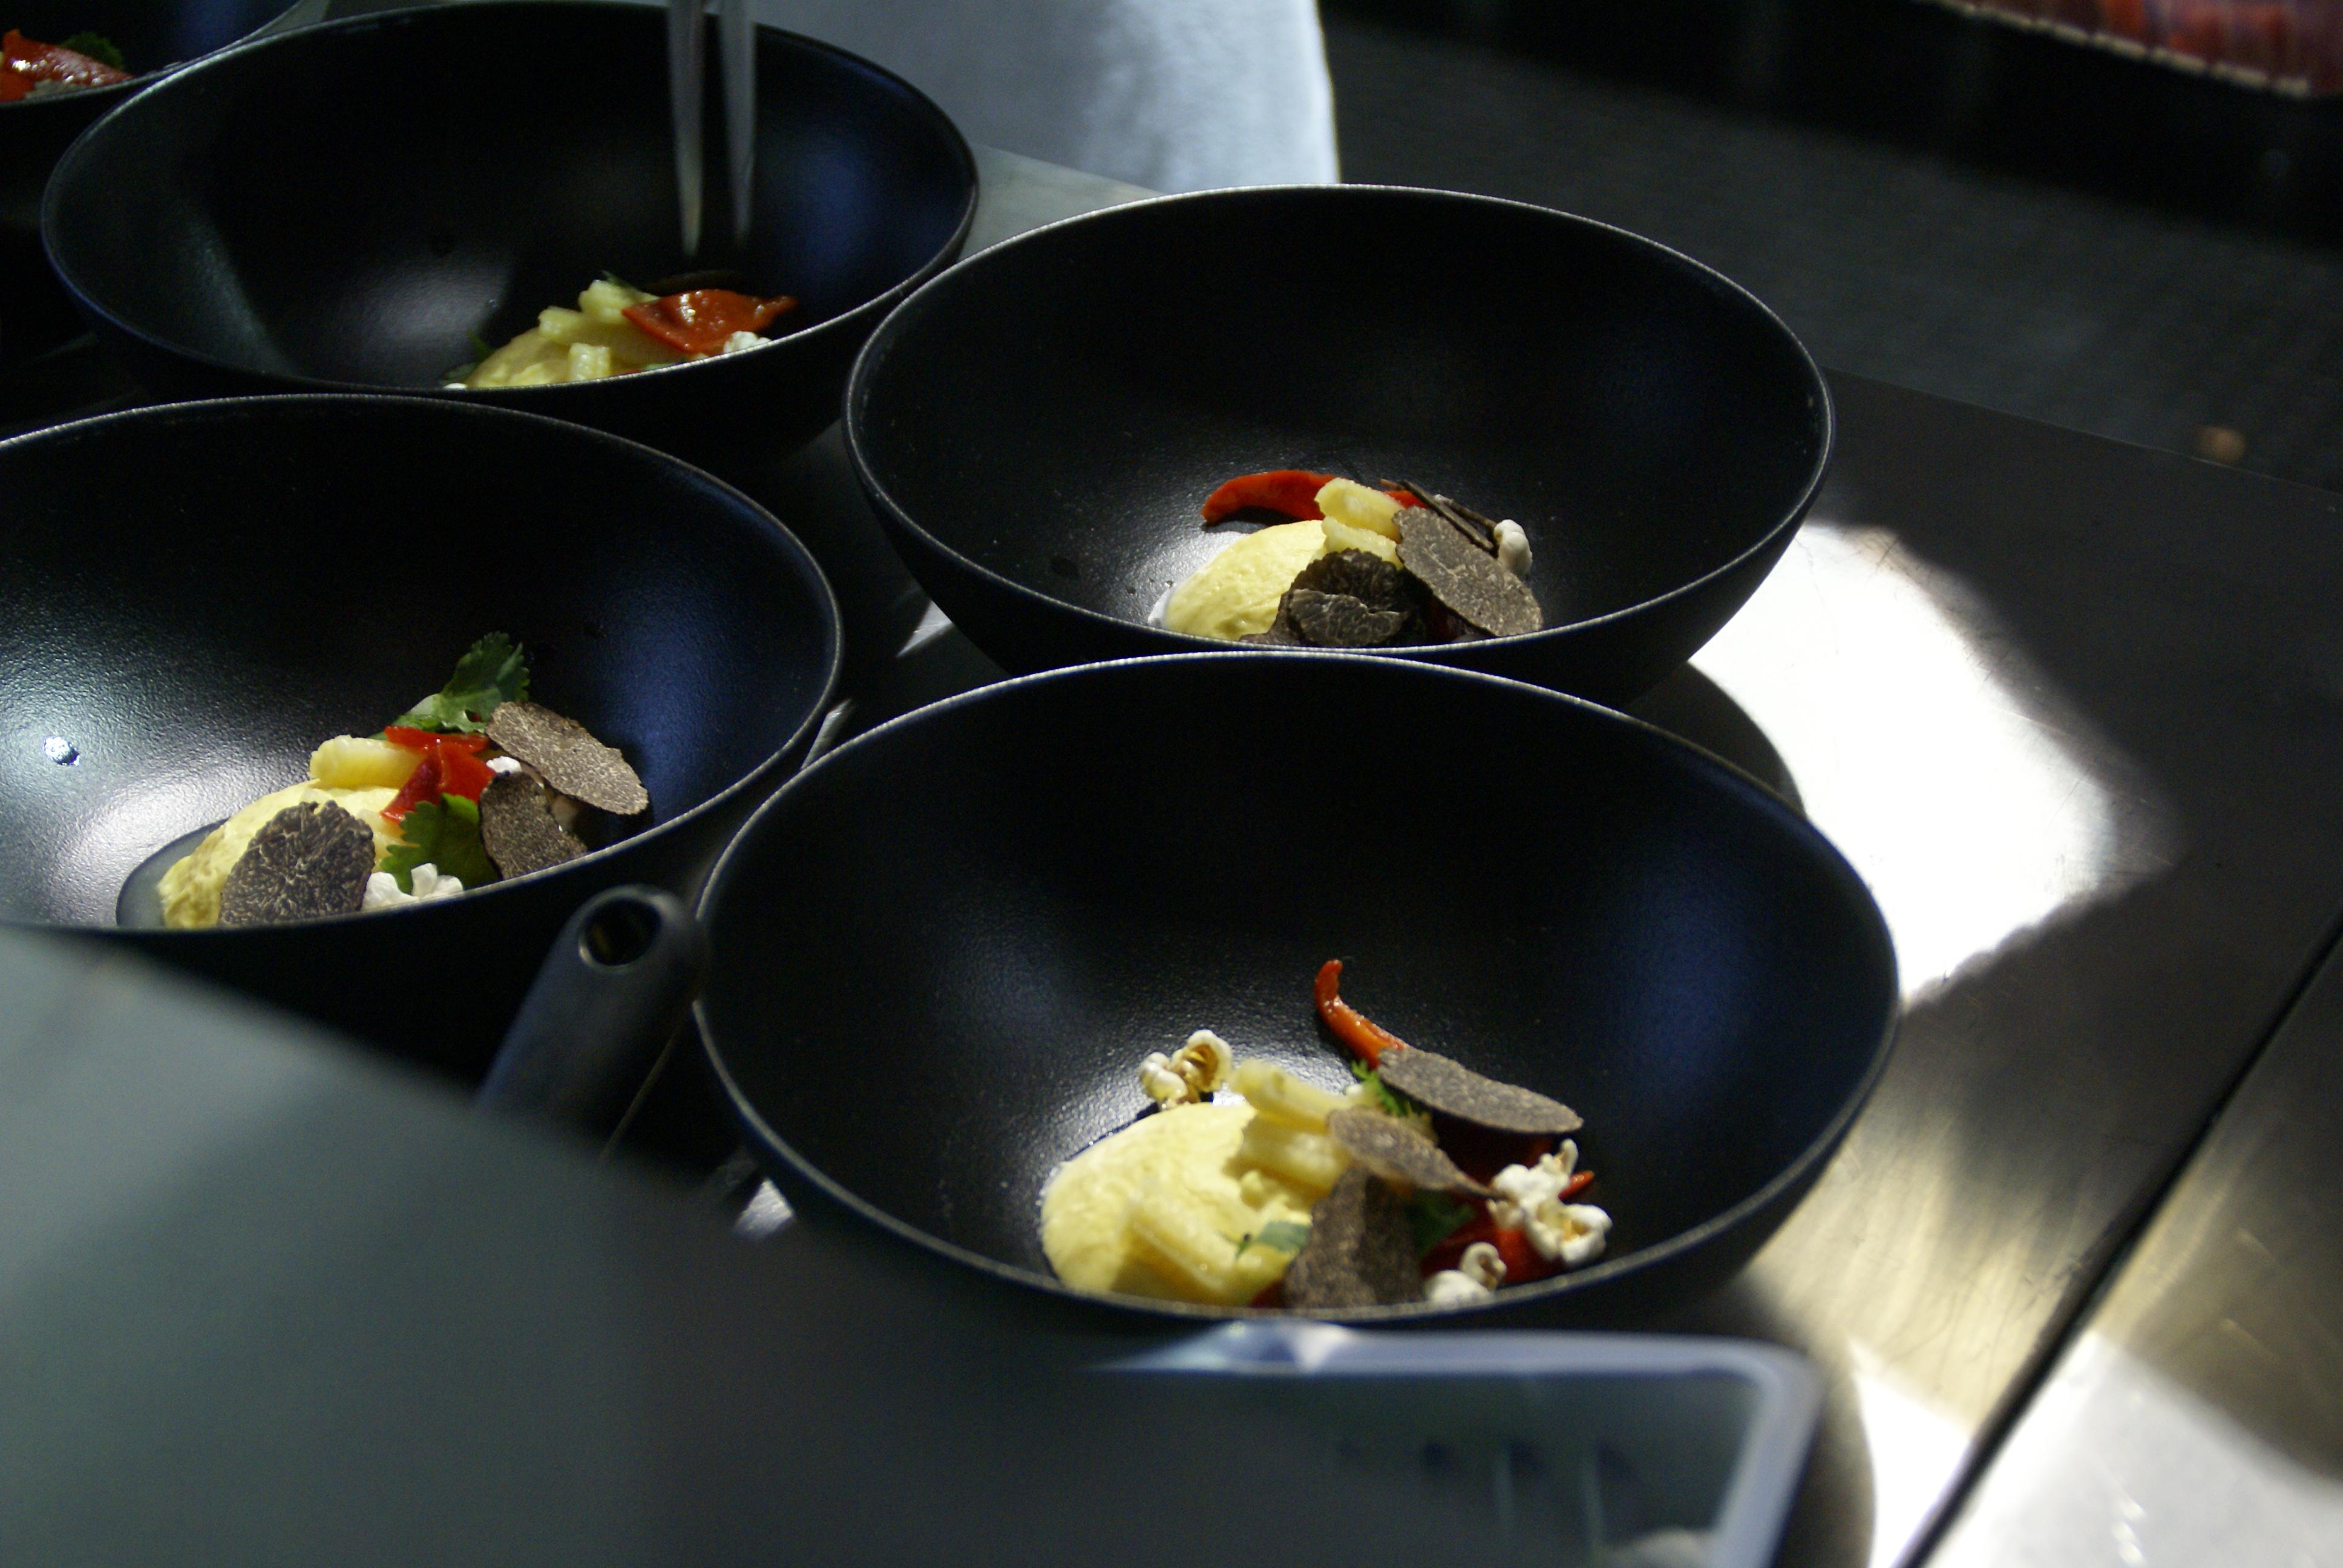 Restaurant 6ième sens